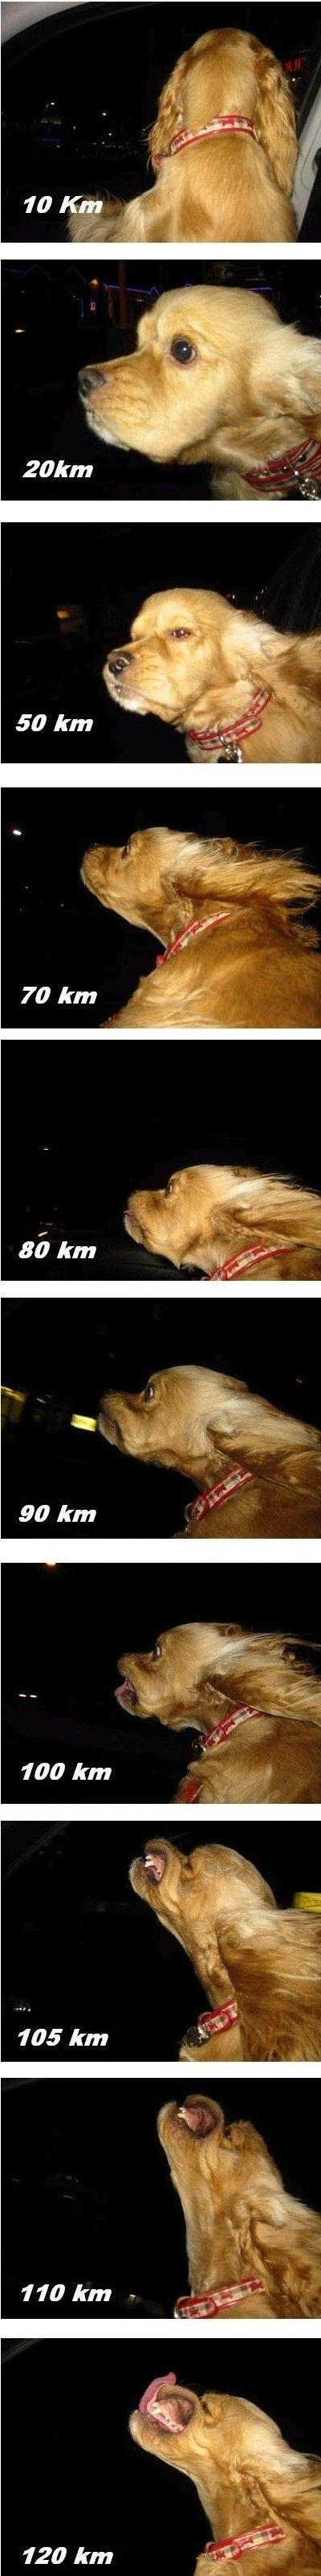 Dog out the window hahahaha